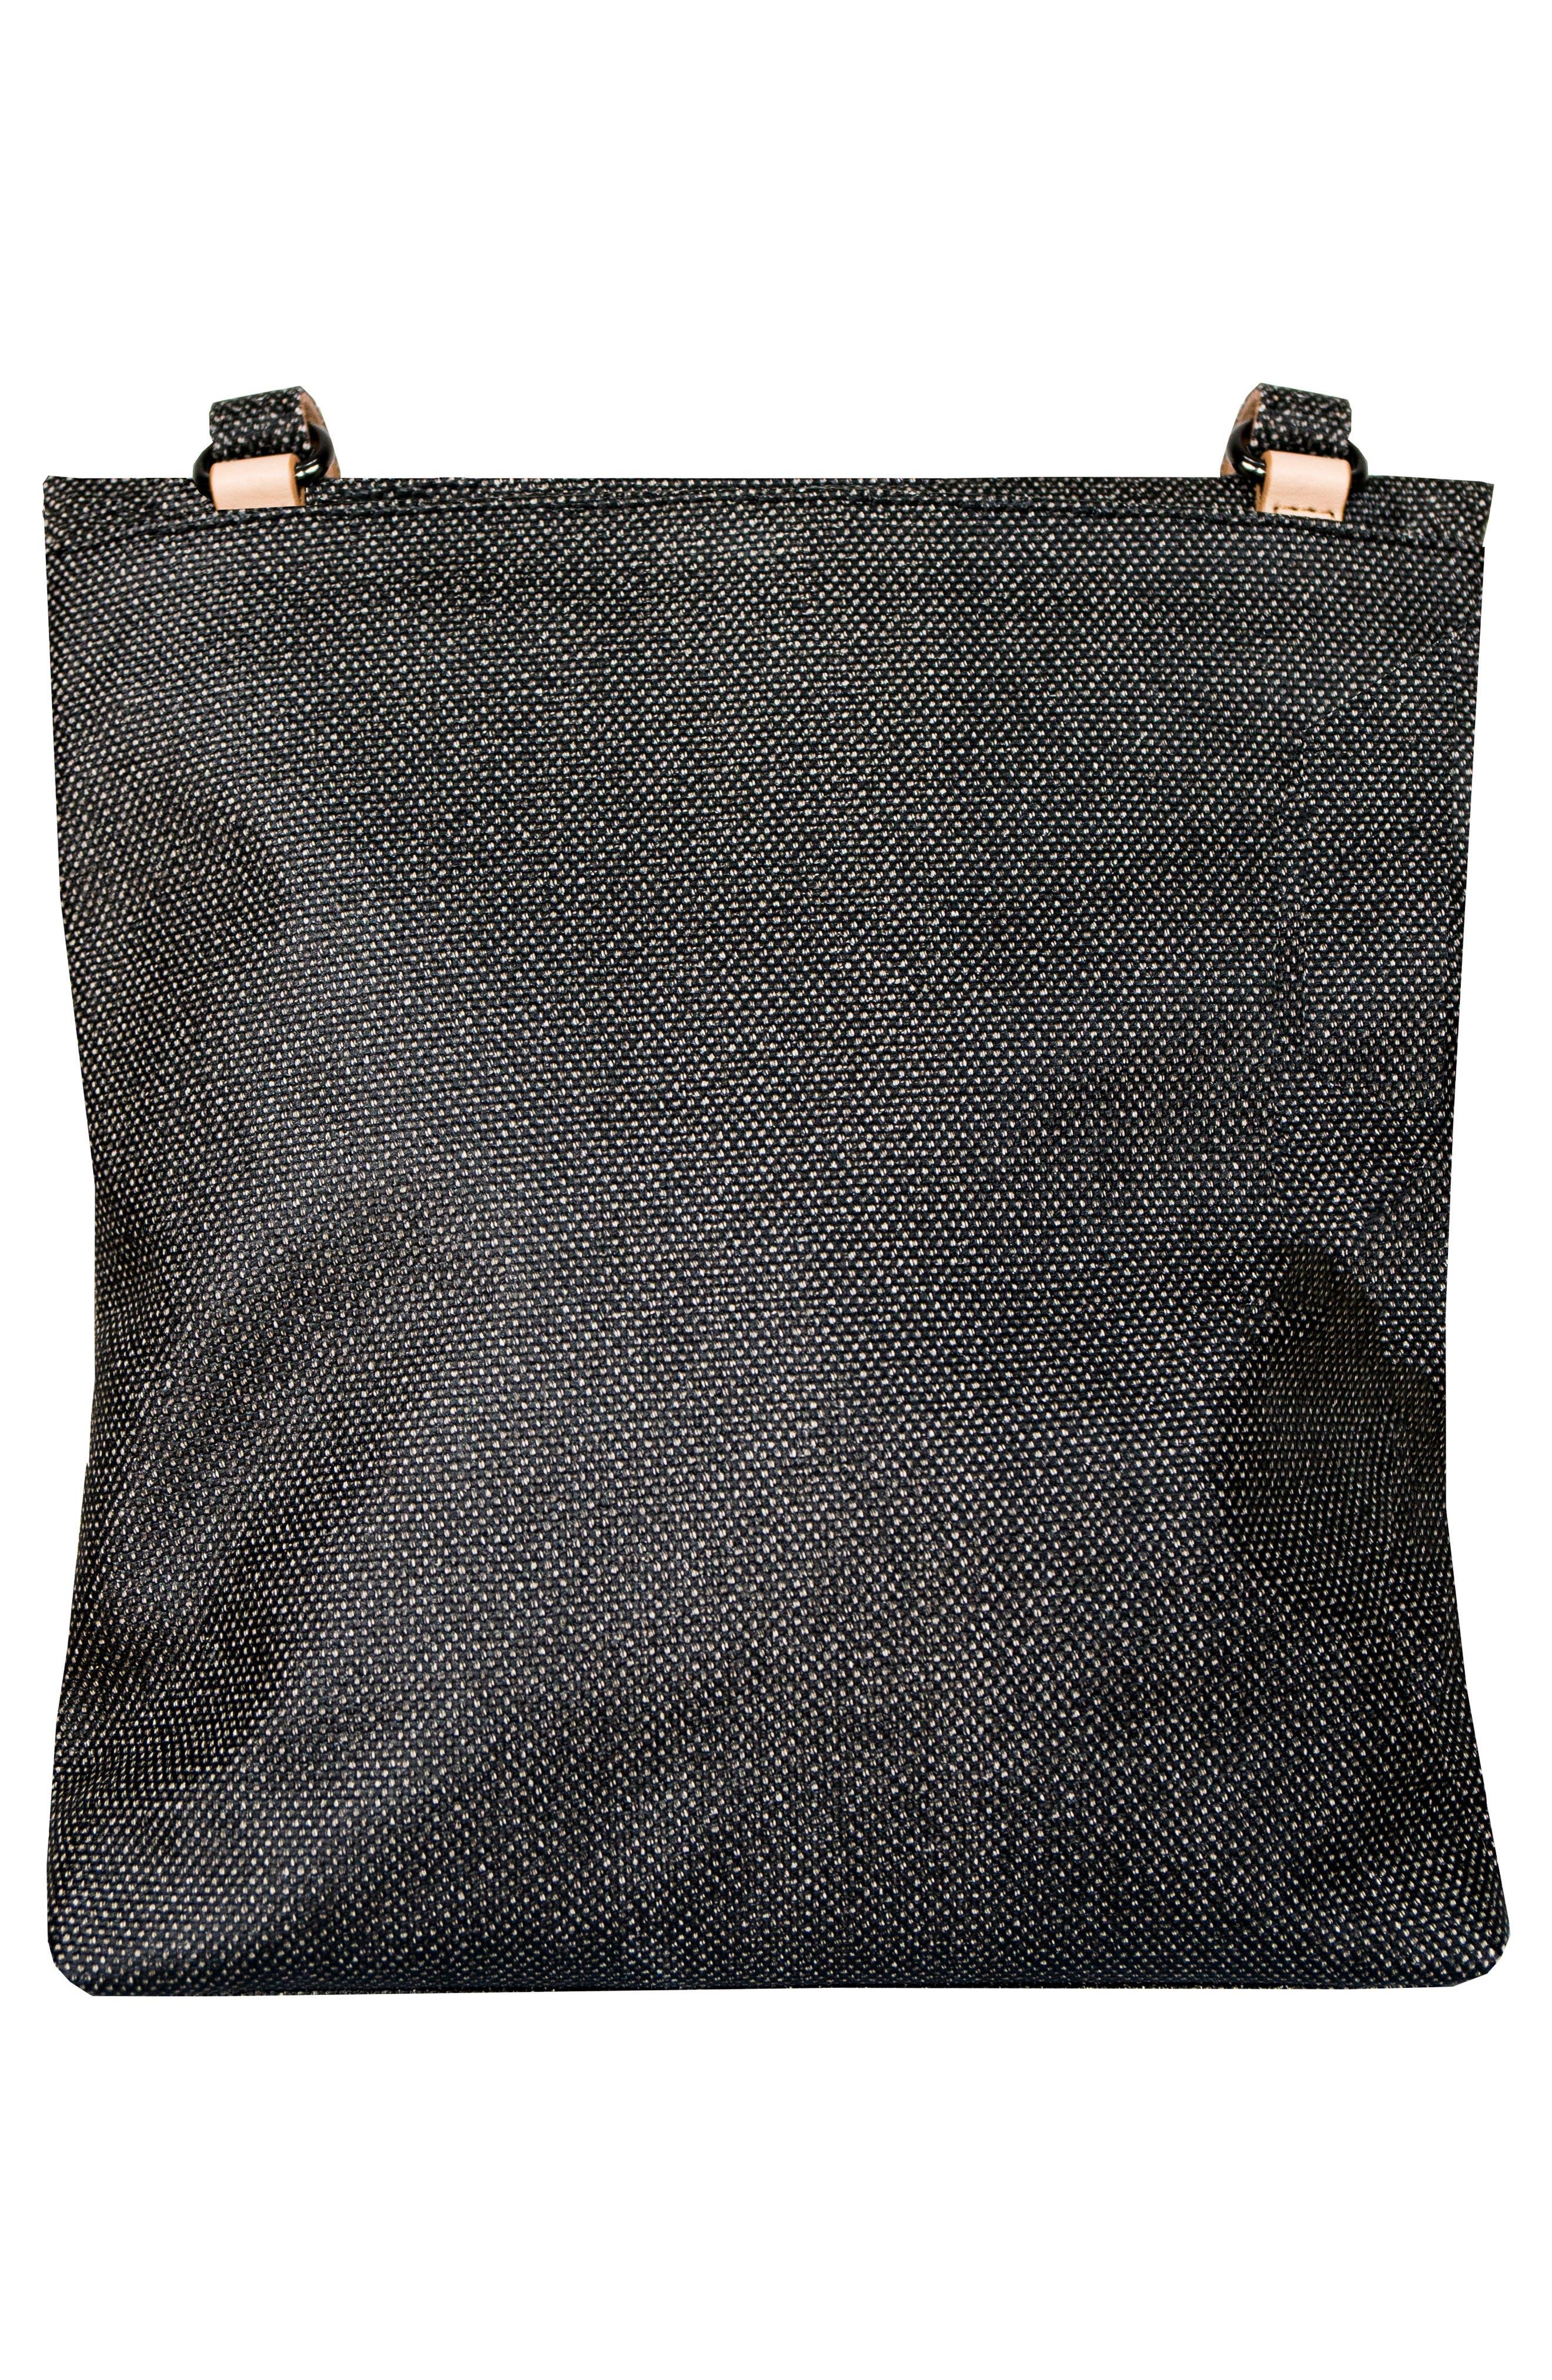 Rebel Coated Canvas Crossbody Bag,                             Alternate thumbnail 3, color,                             Blackstone